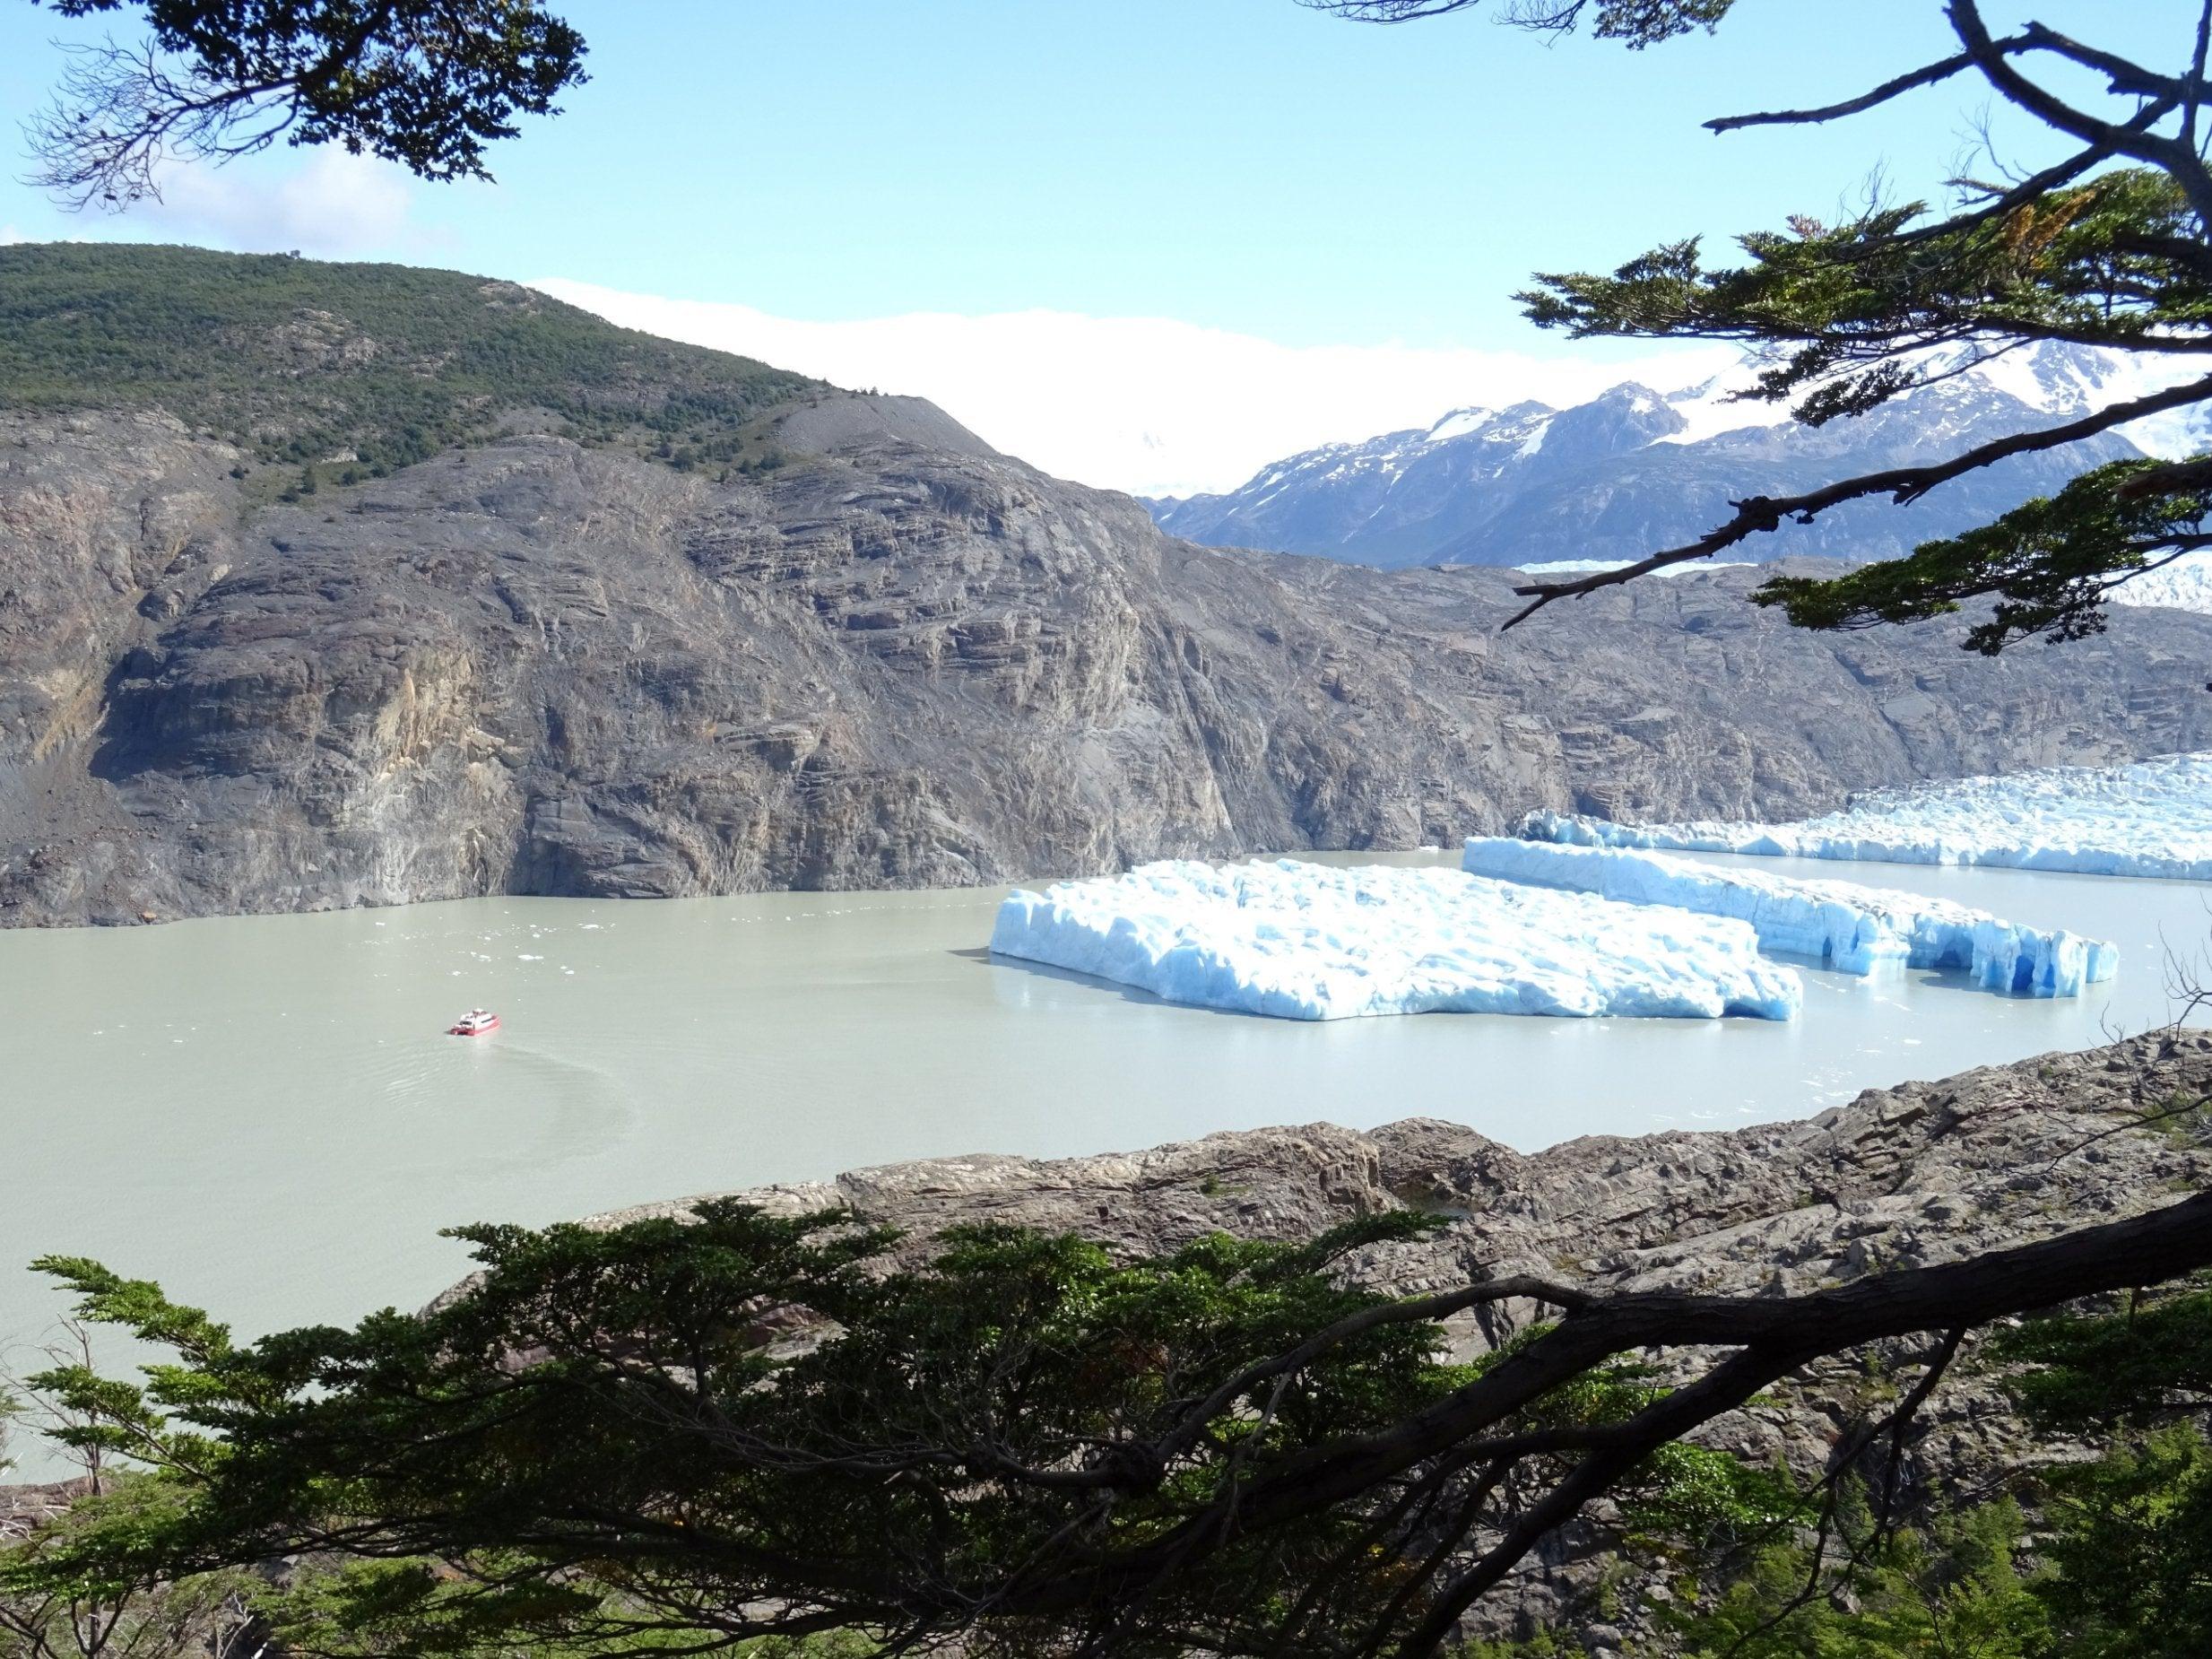 Fresh iceberg ruptures in Patagonia raise alarm about global warming